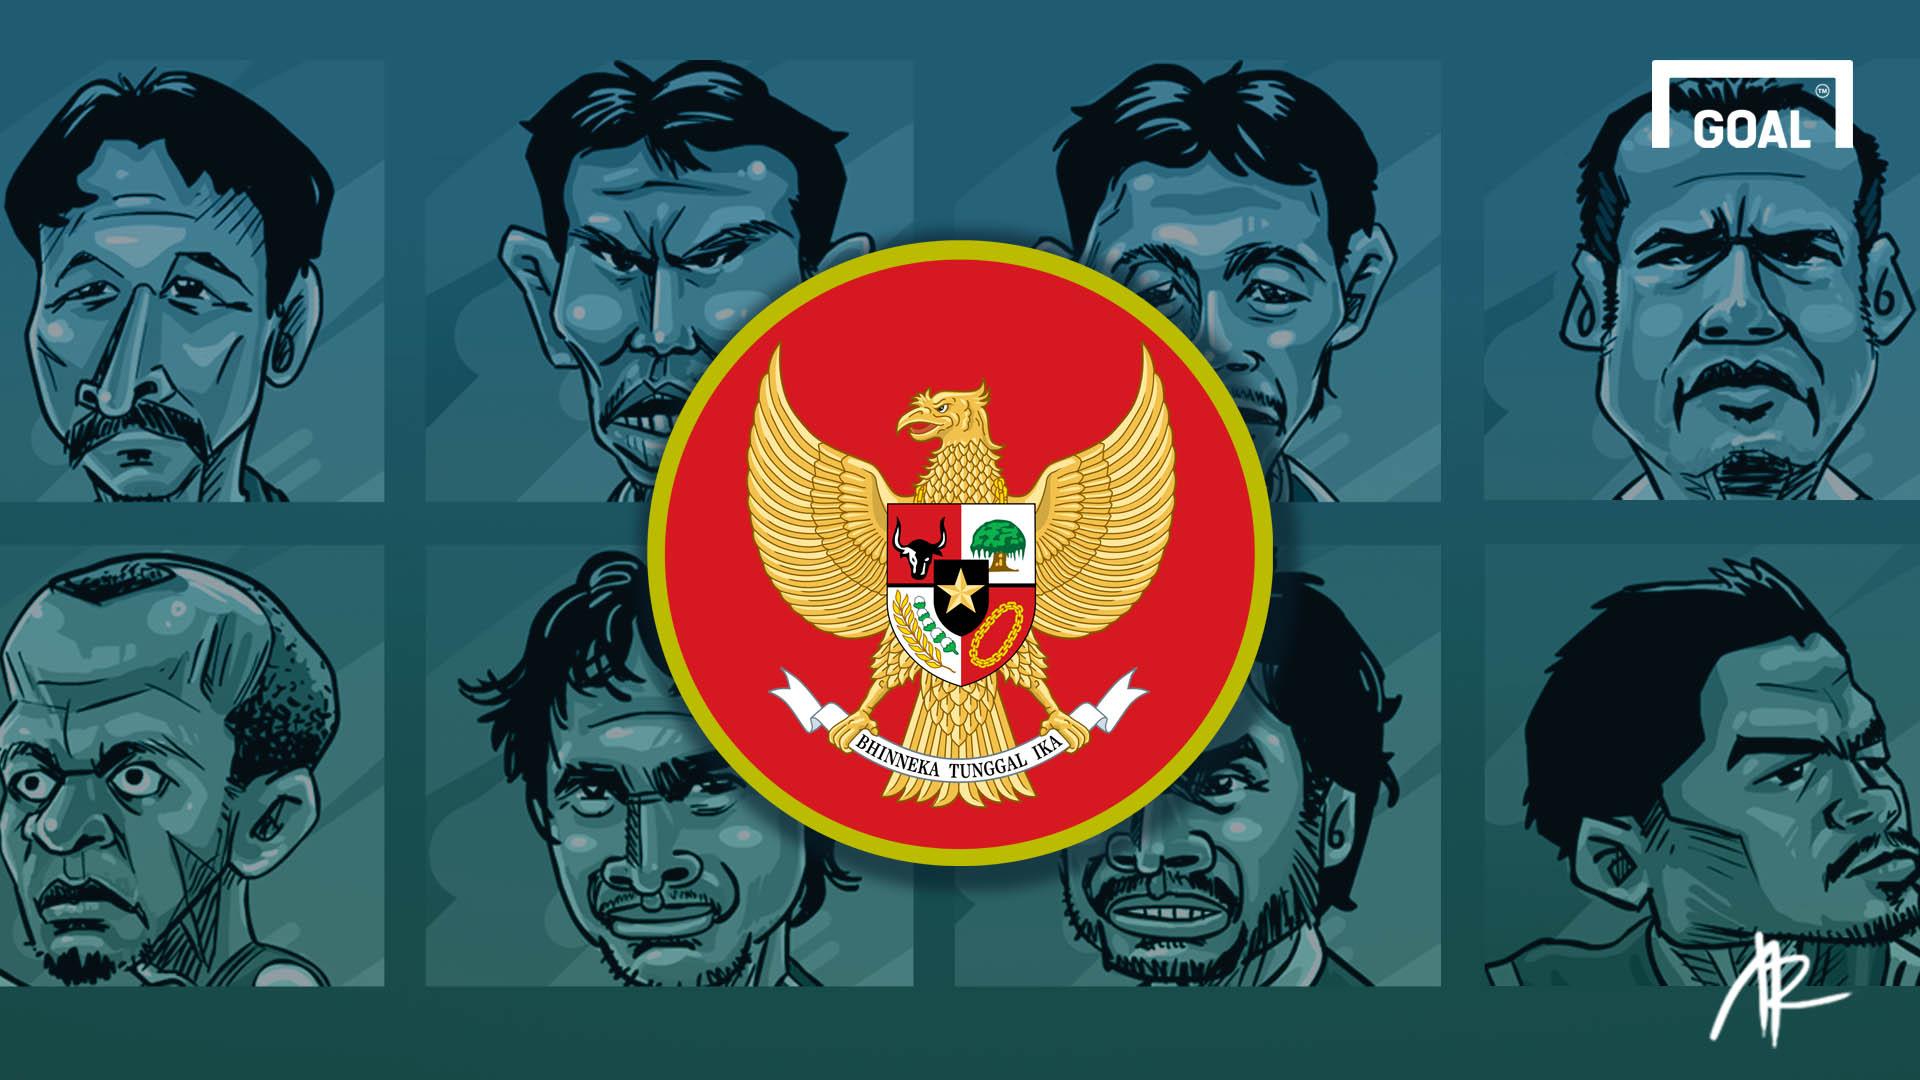 Galeri Kartun: Parade Jersey Timnas Indonesia Dari Piala AFF Ke Piala AFF - Goal.com